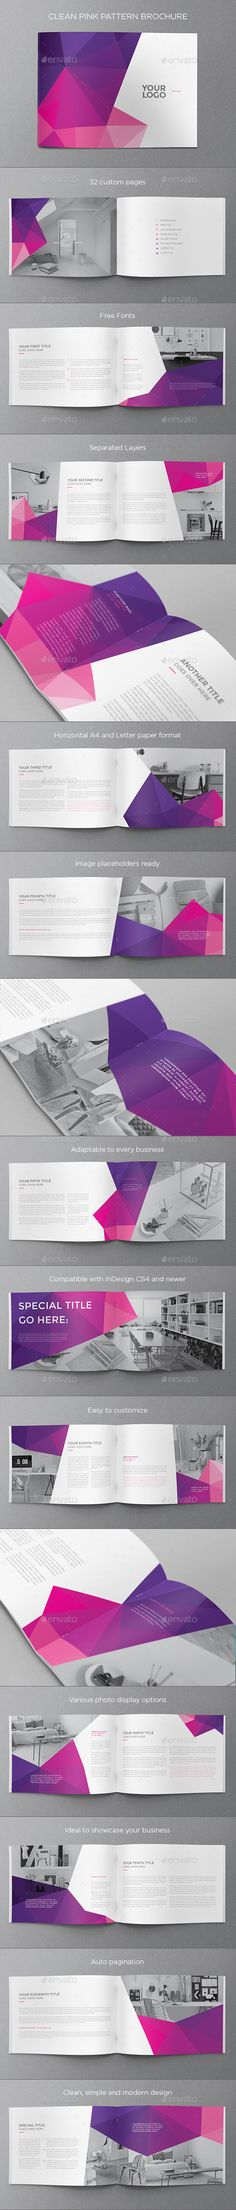 Clean Pink Pattern Brochure Template #design #broschüre Download: http://graphicriver.net/item/clean-pink-pattern-brochure/12366013?ref=ksioks